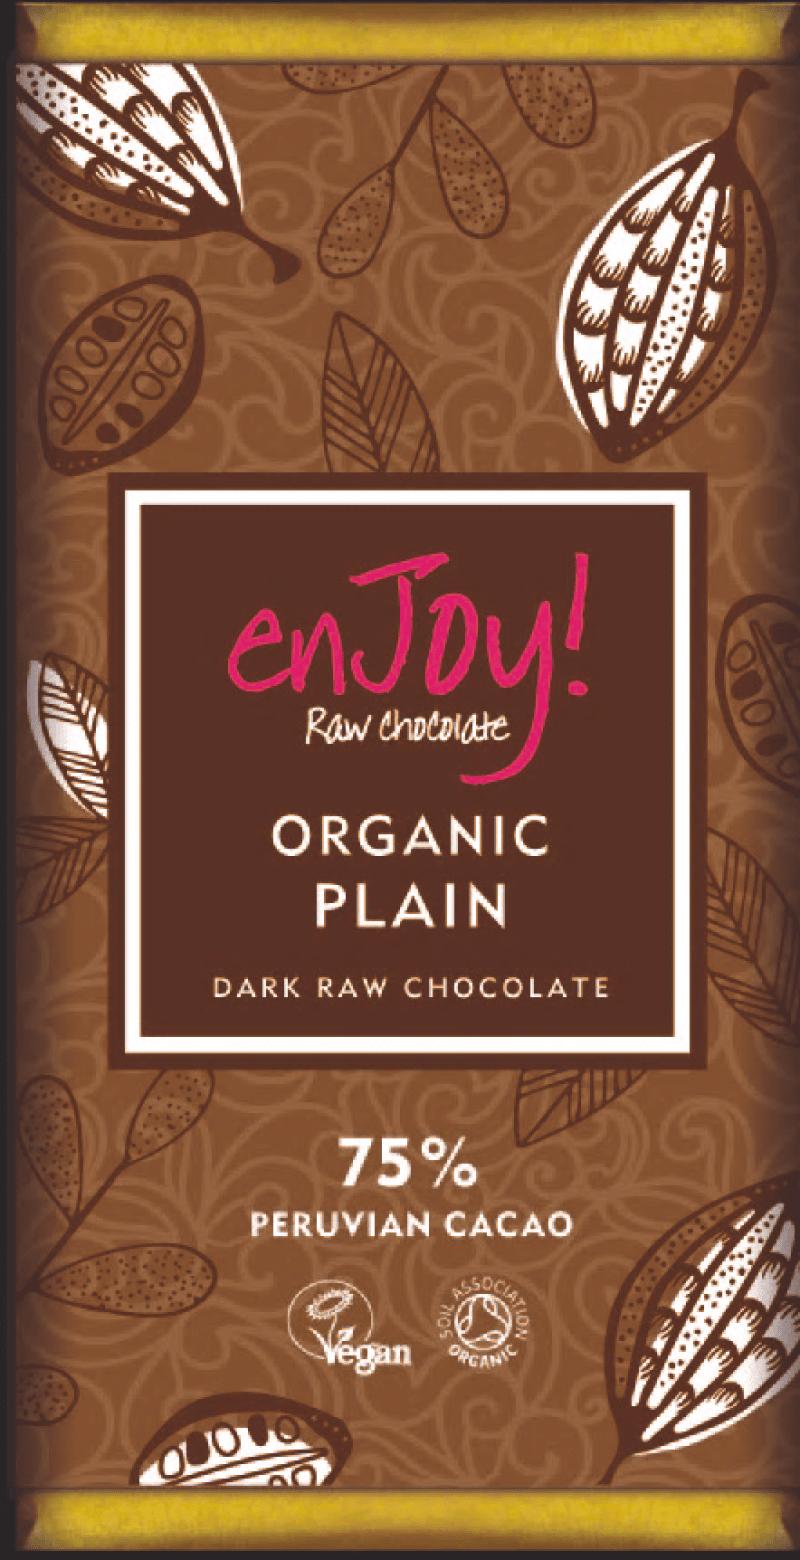 Enjoy! raw chocolate